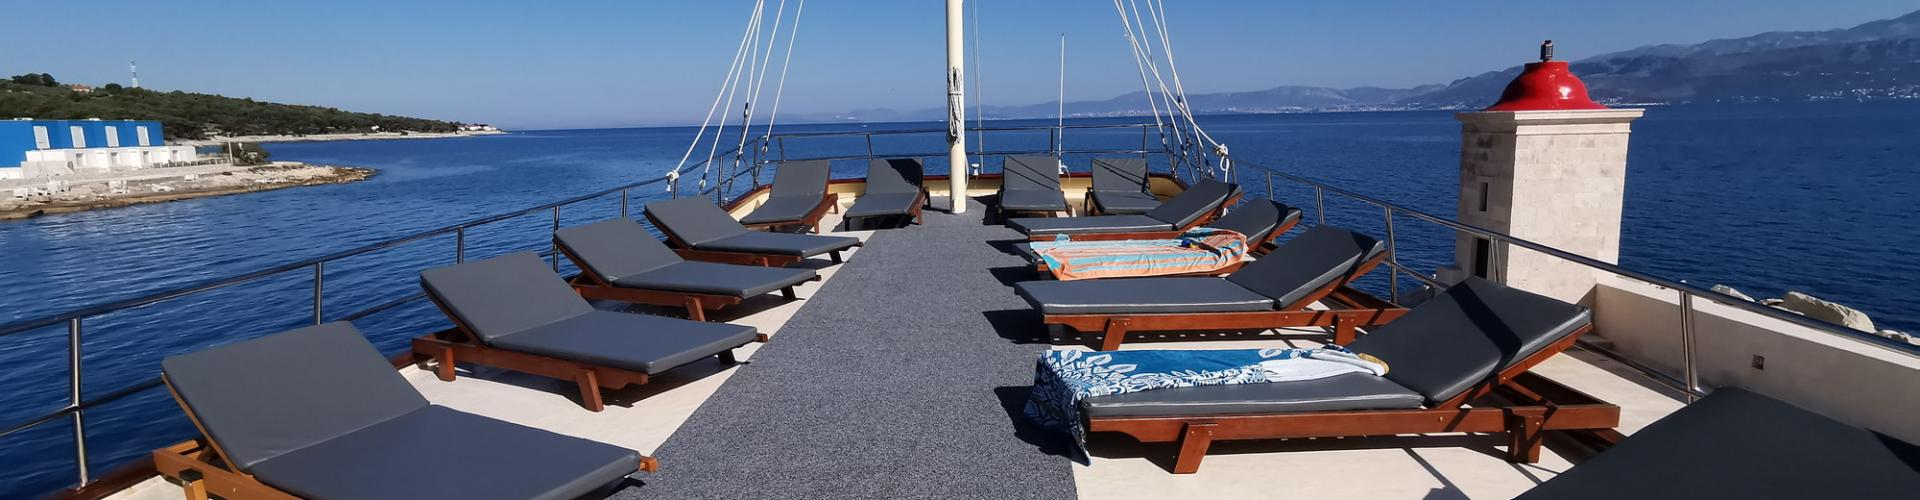 motor sailer Premium cruiser MV Leonardo